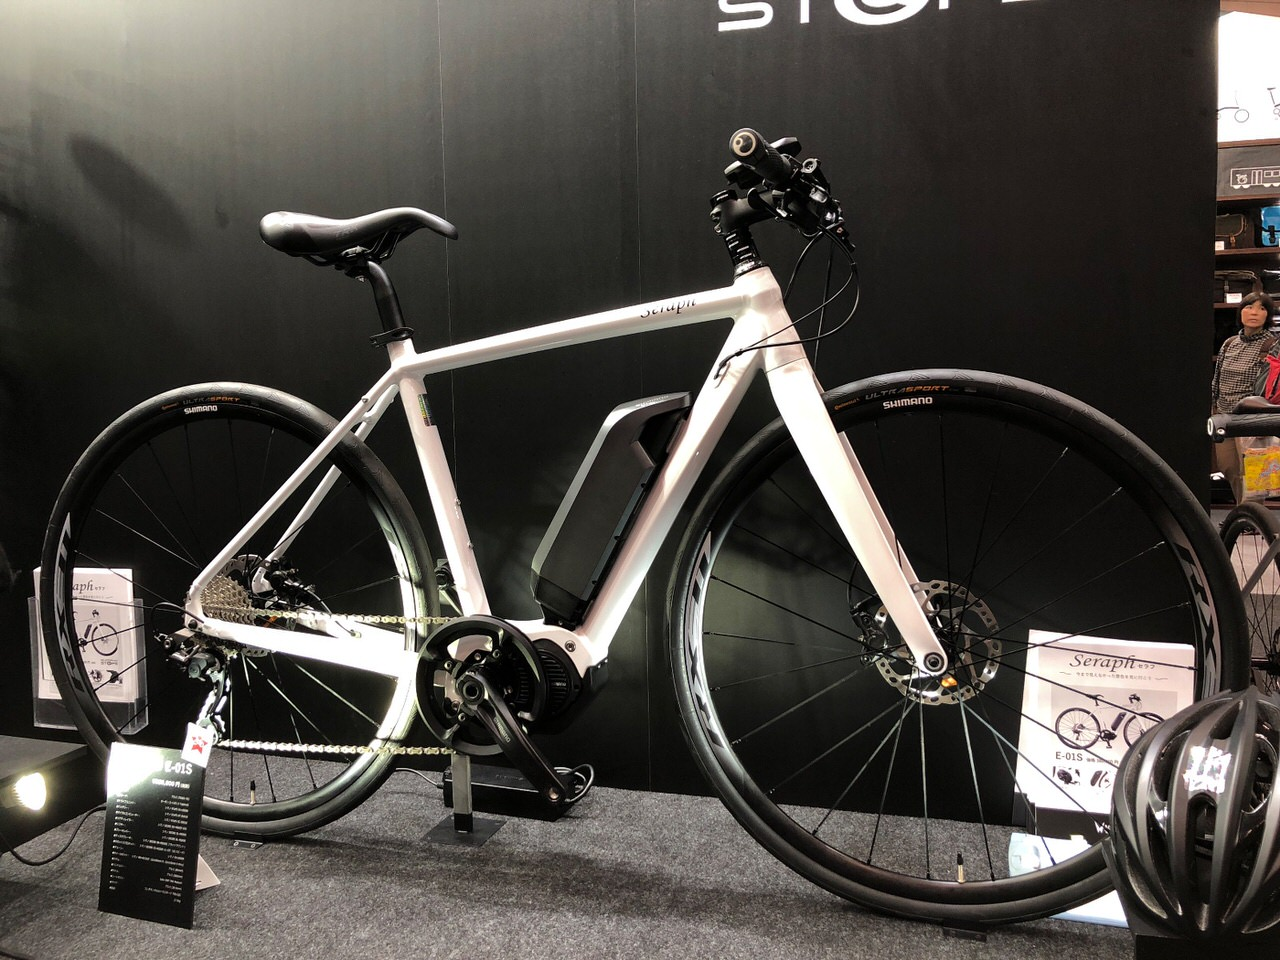 Cyclemode 0439